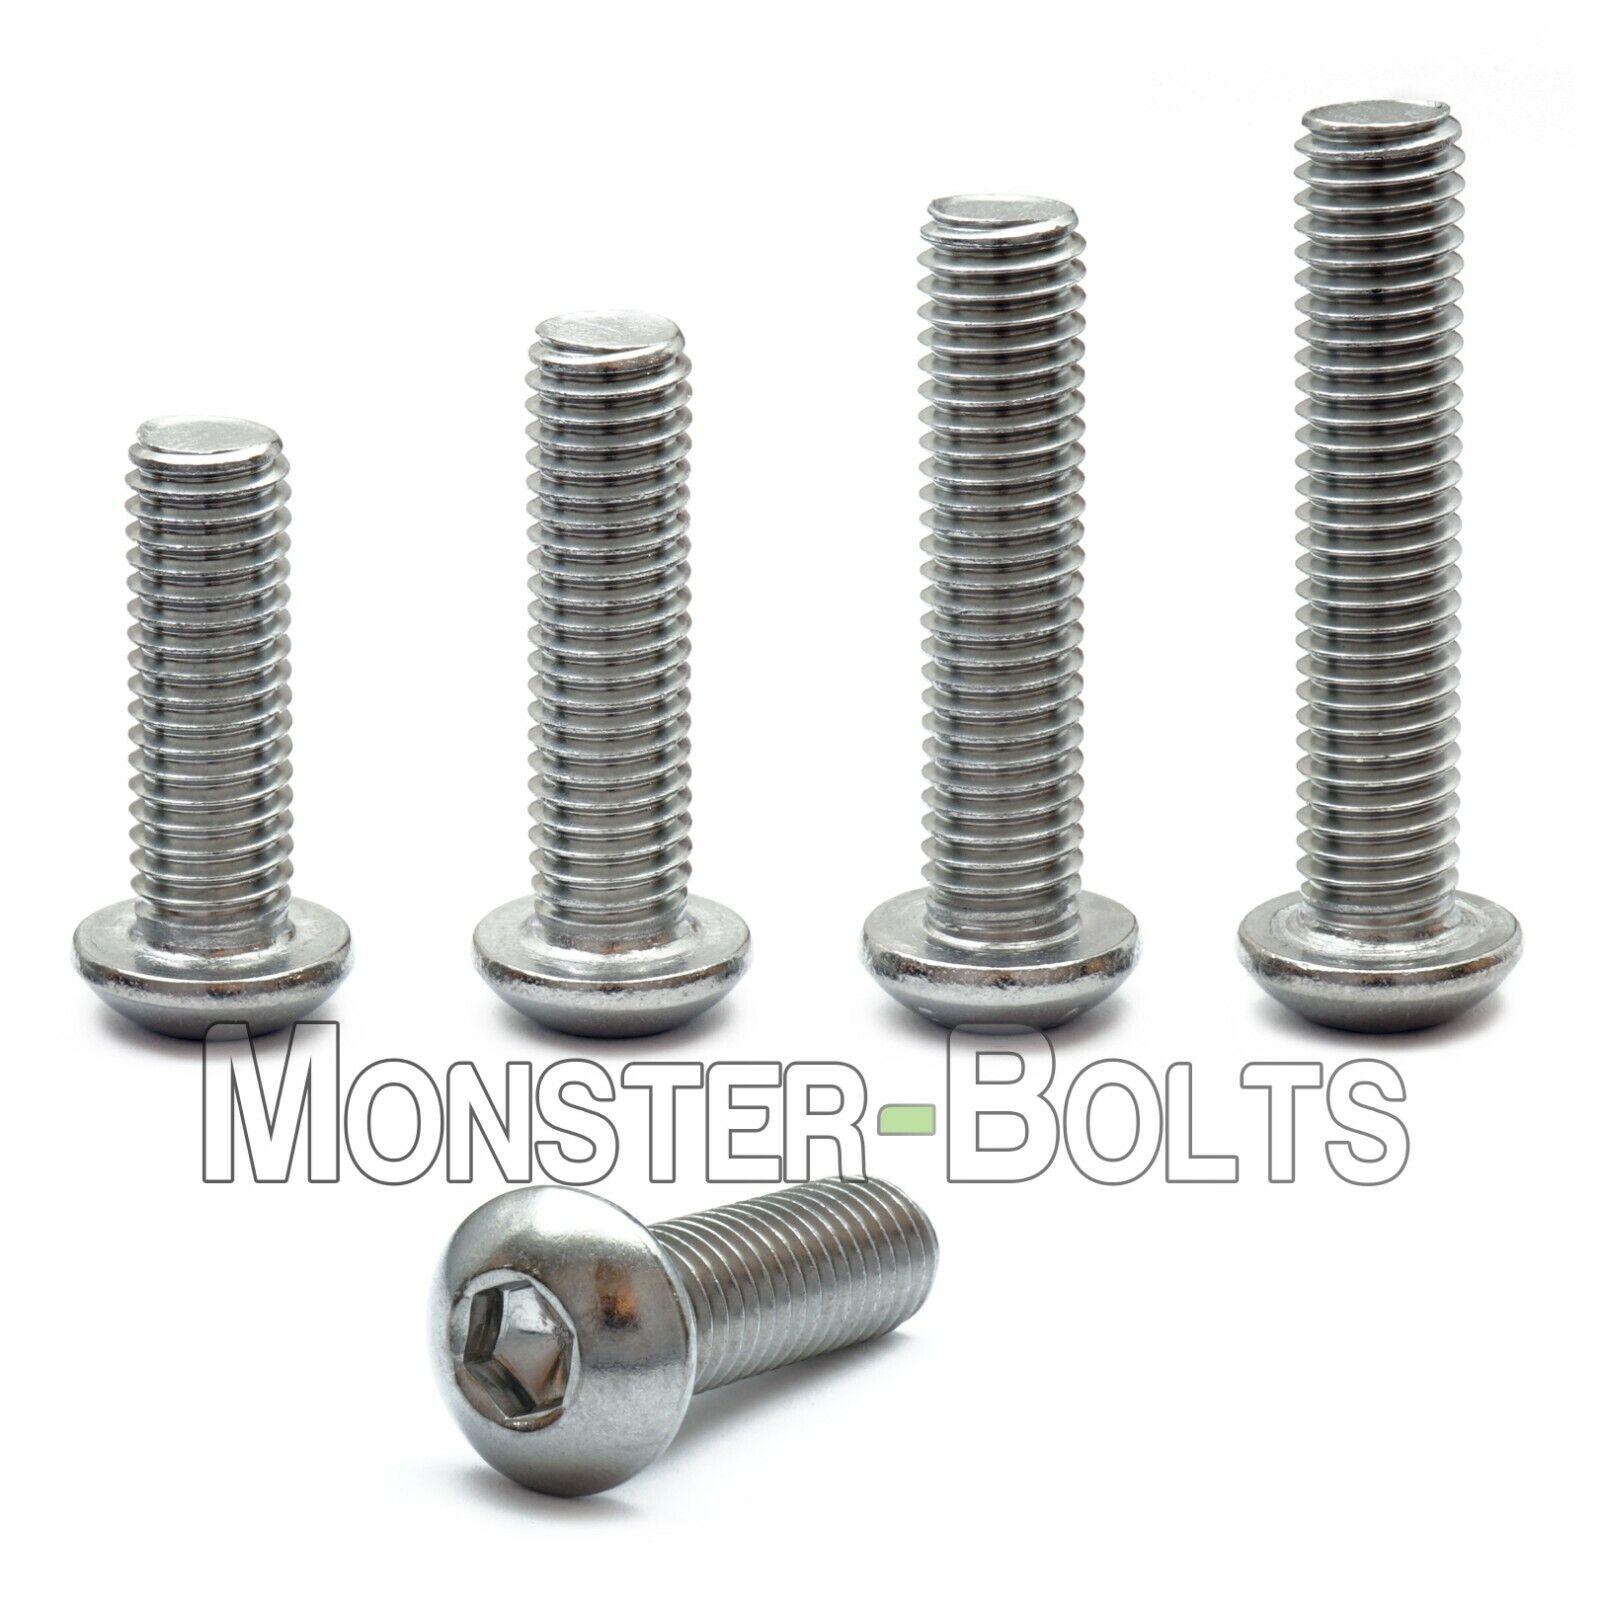 M5 x 12mm Button Head Socket Cap Screws,Pack 50-Piece,Stainless Steel,Full Thread,Metric